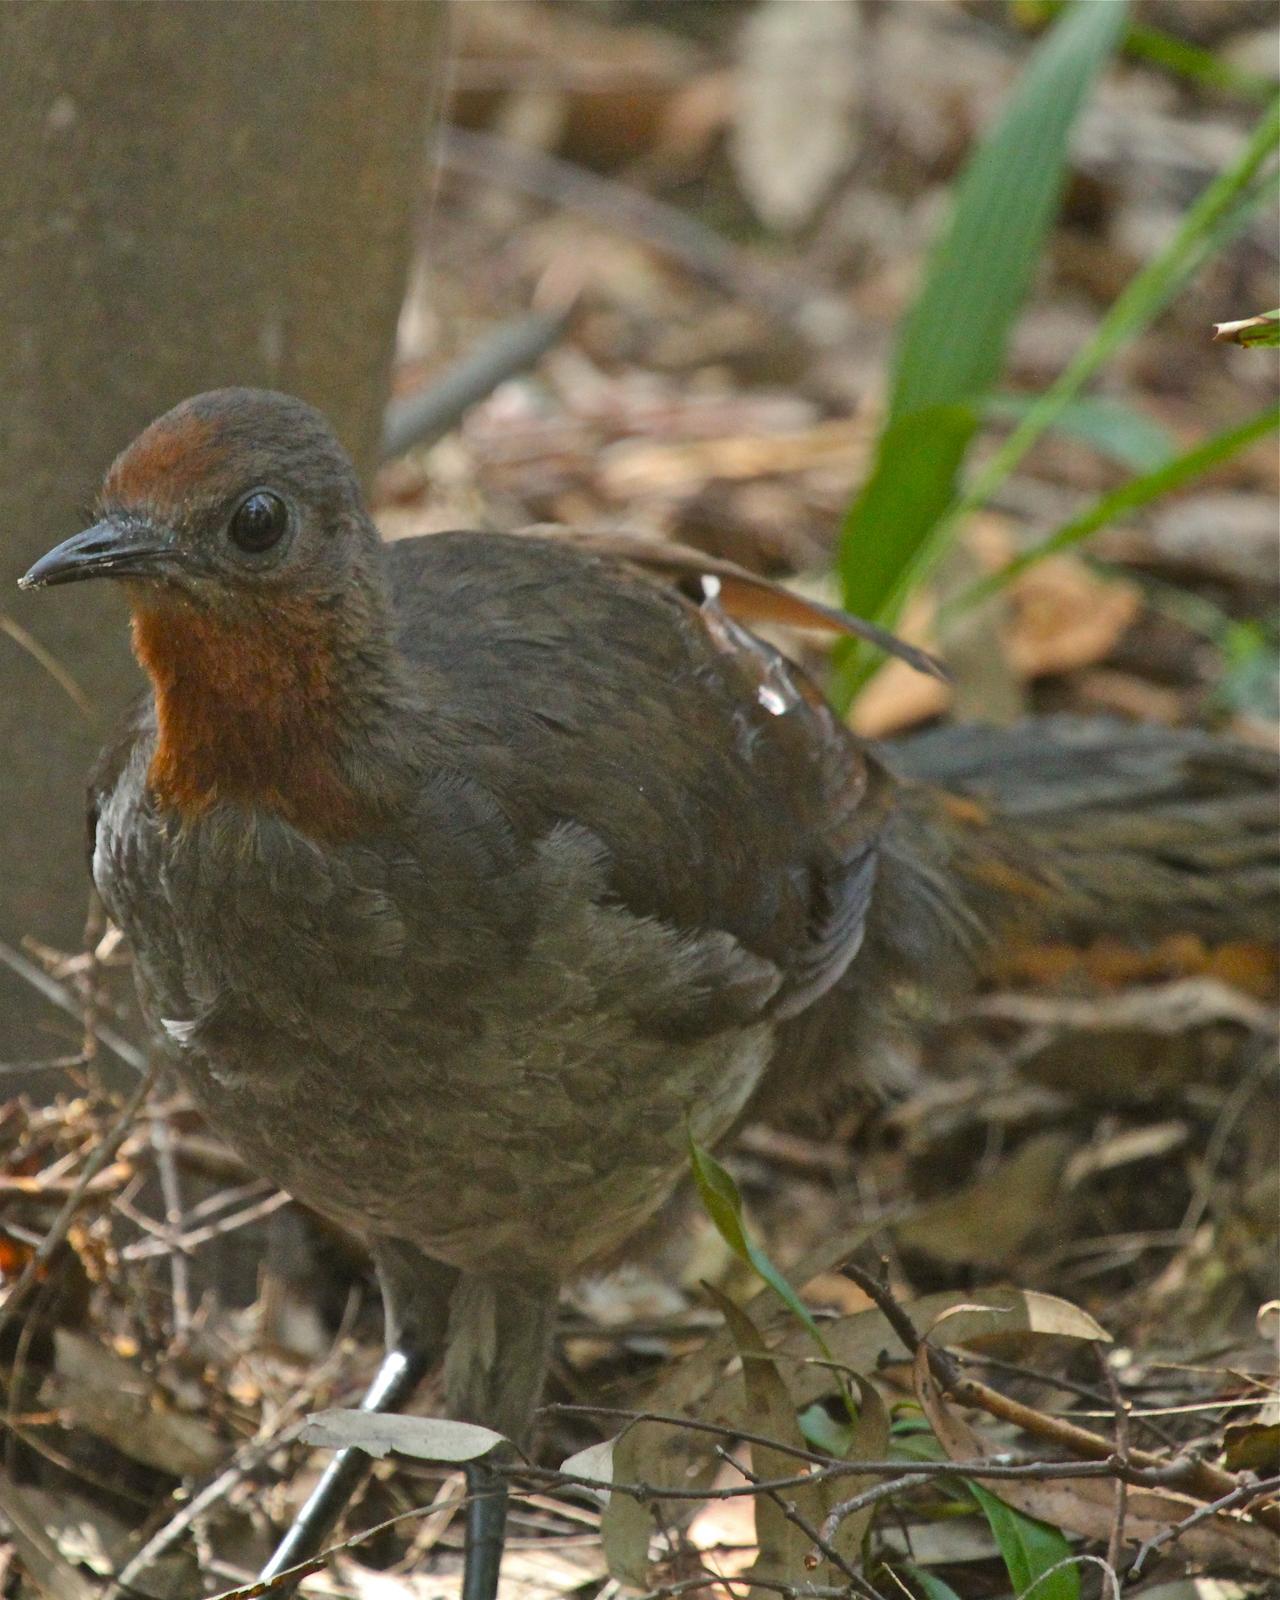 Superb Lyrebird Photo by R. Bruce Richardson